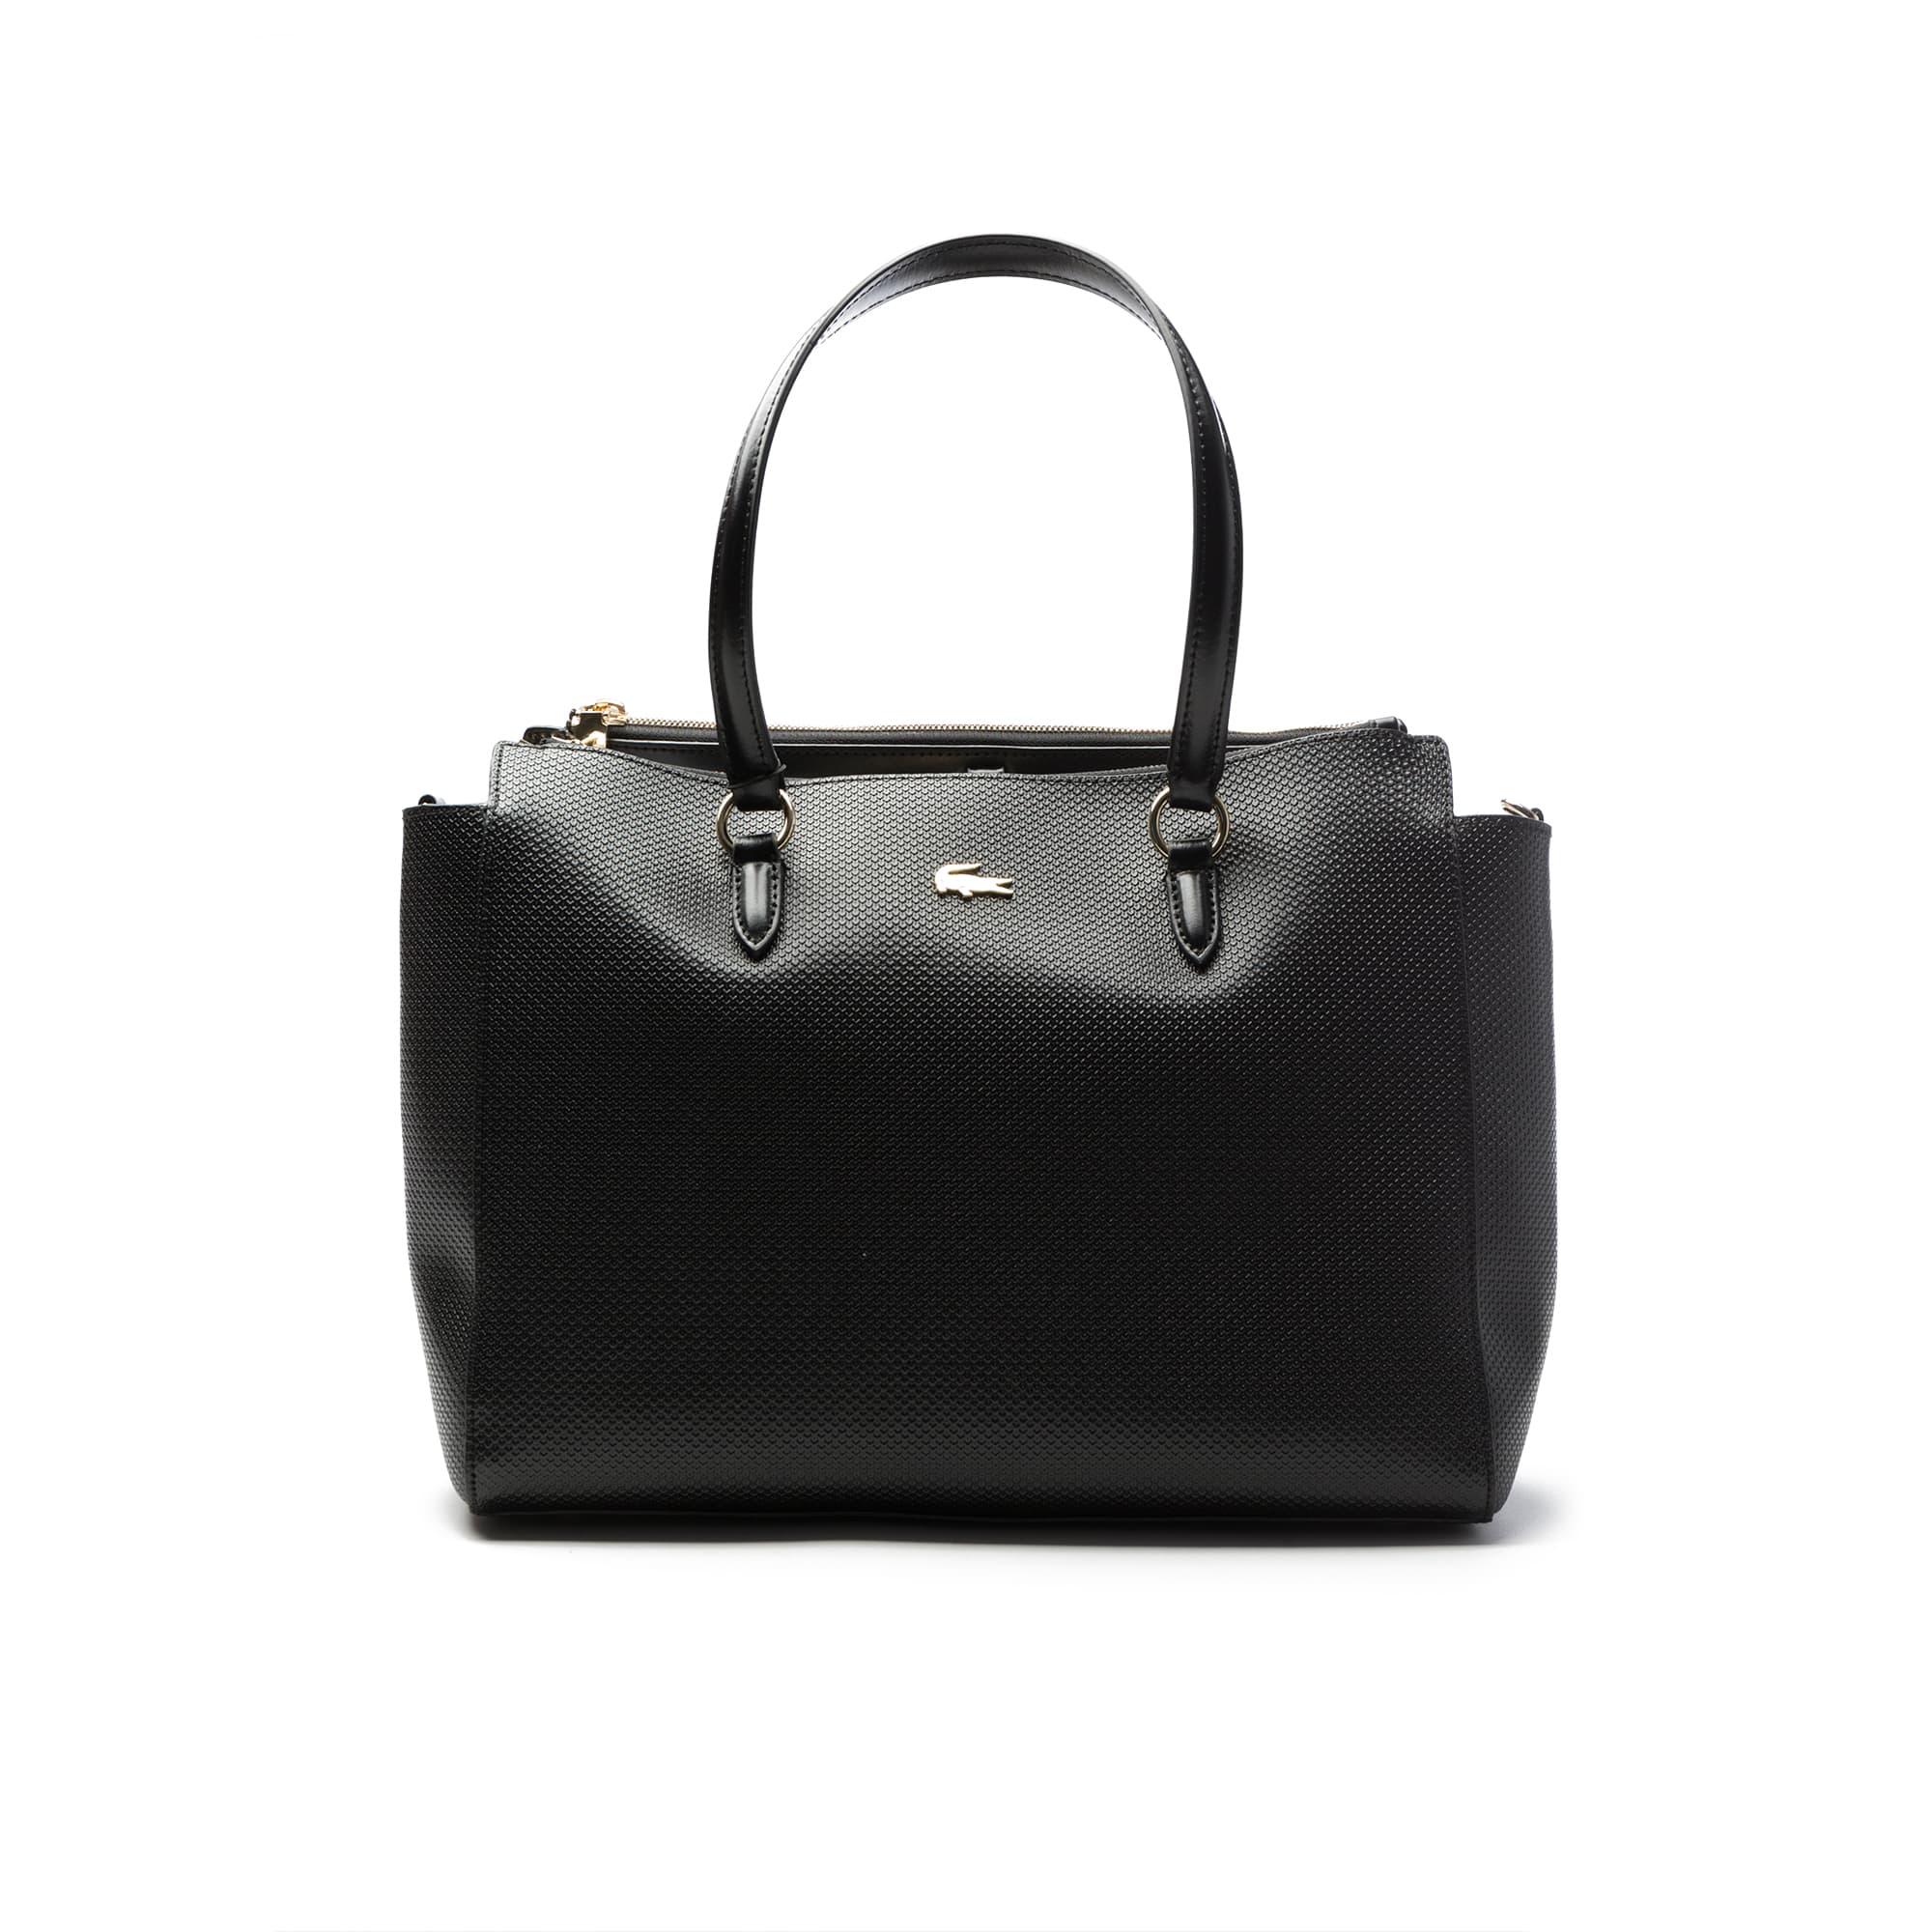 Women's Chantaco Gusseted Fine Piqué Leather Double Zip Tote Bag